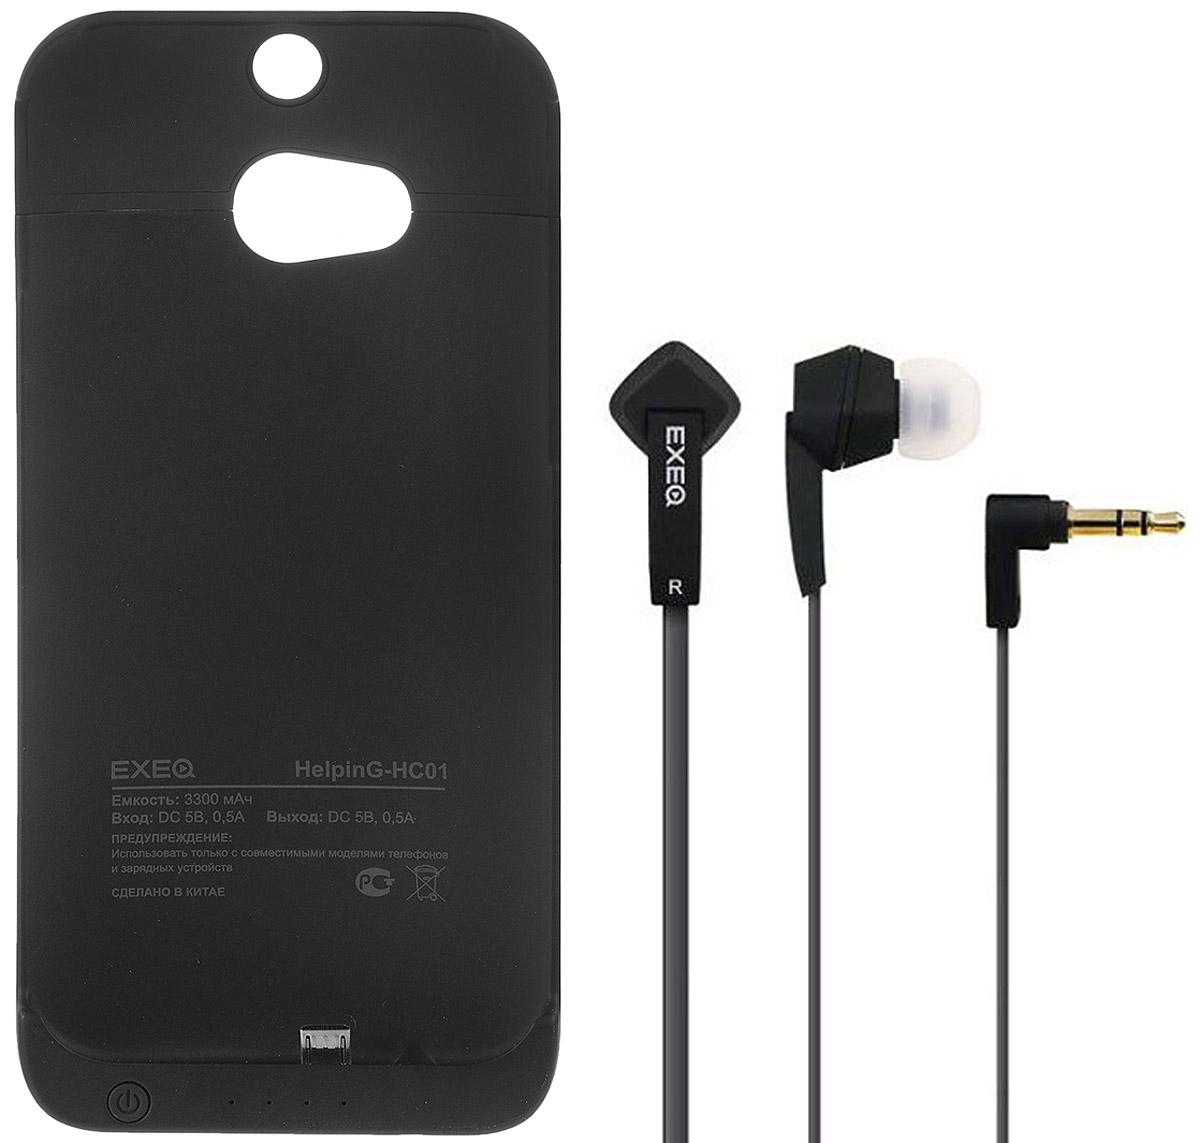 EXEQ HelpinG-HC01 чехол-аккумулятор для HTC One M8, Black (3300 мАч, клип-кейс) телефон htc one в рассрочку в минске